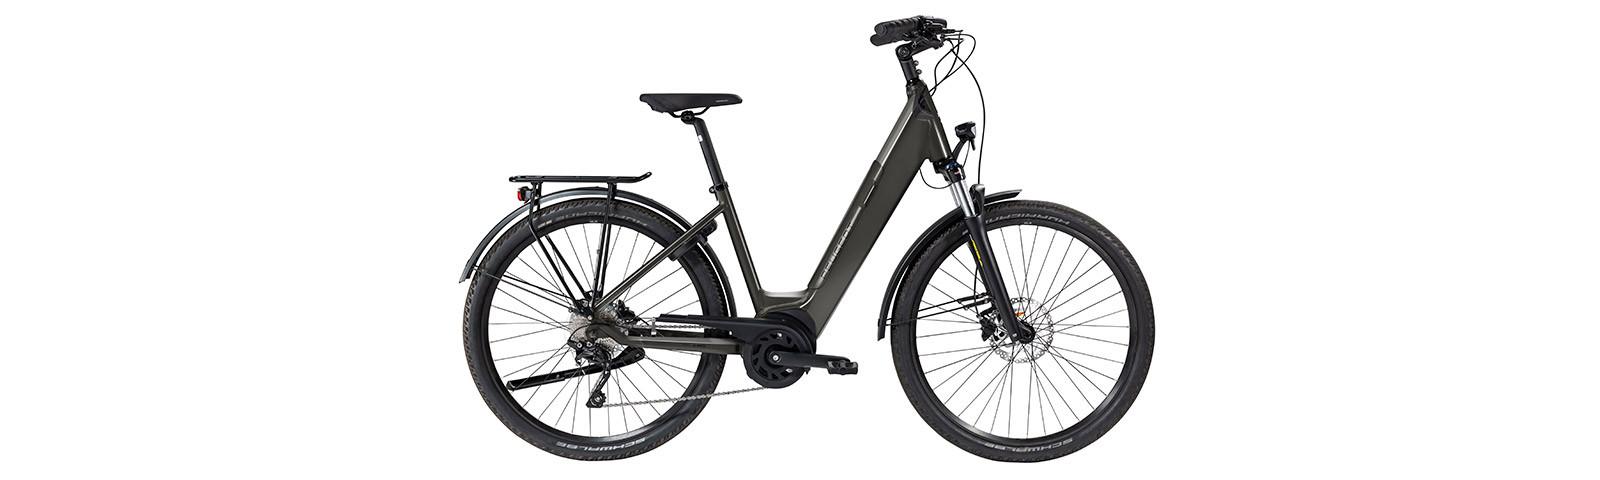 PEUGEOT Cycles reinventa la bicicleta urbana con Crossover